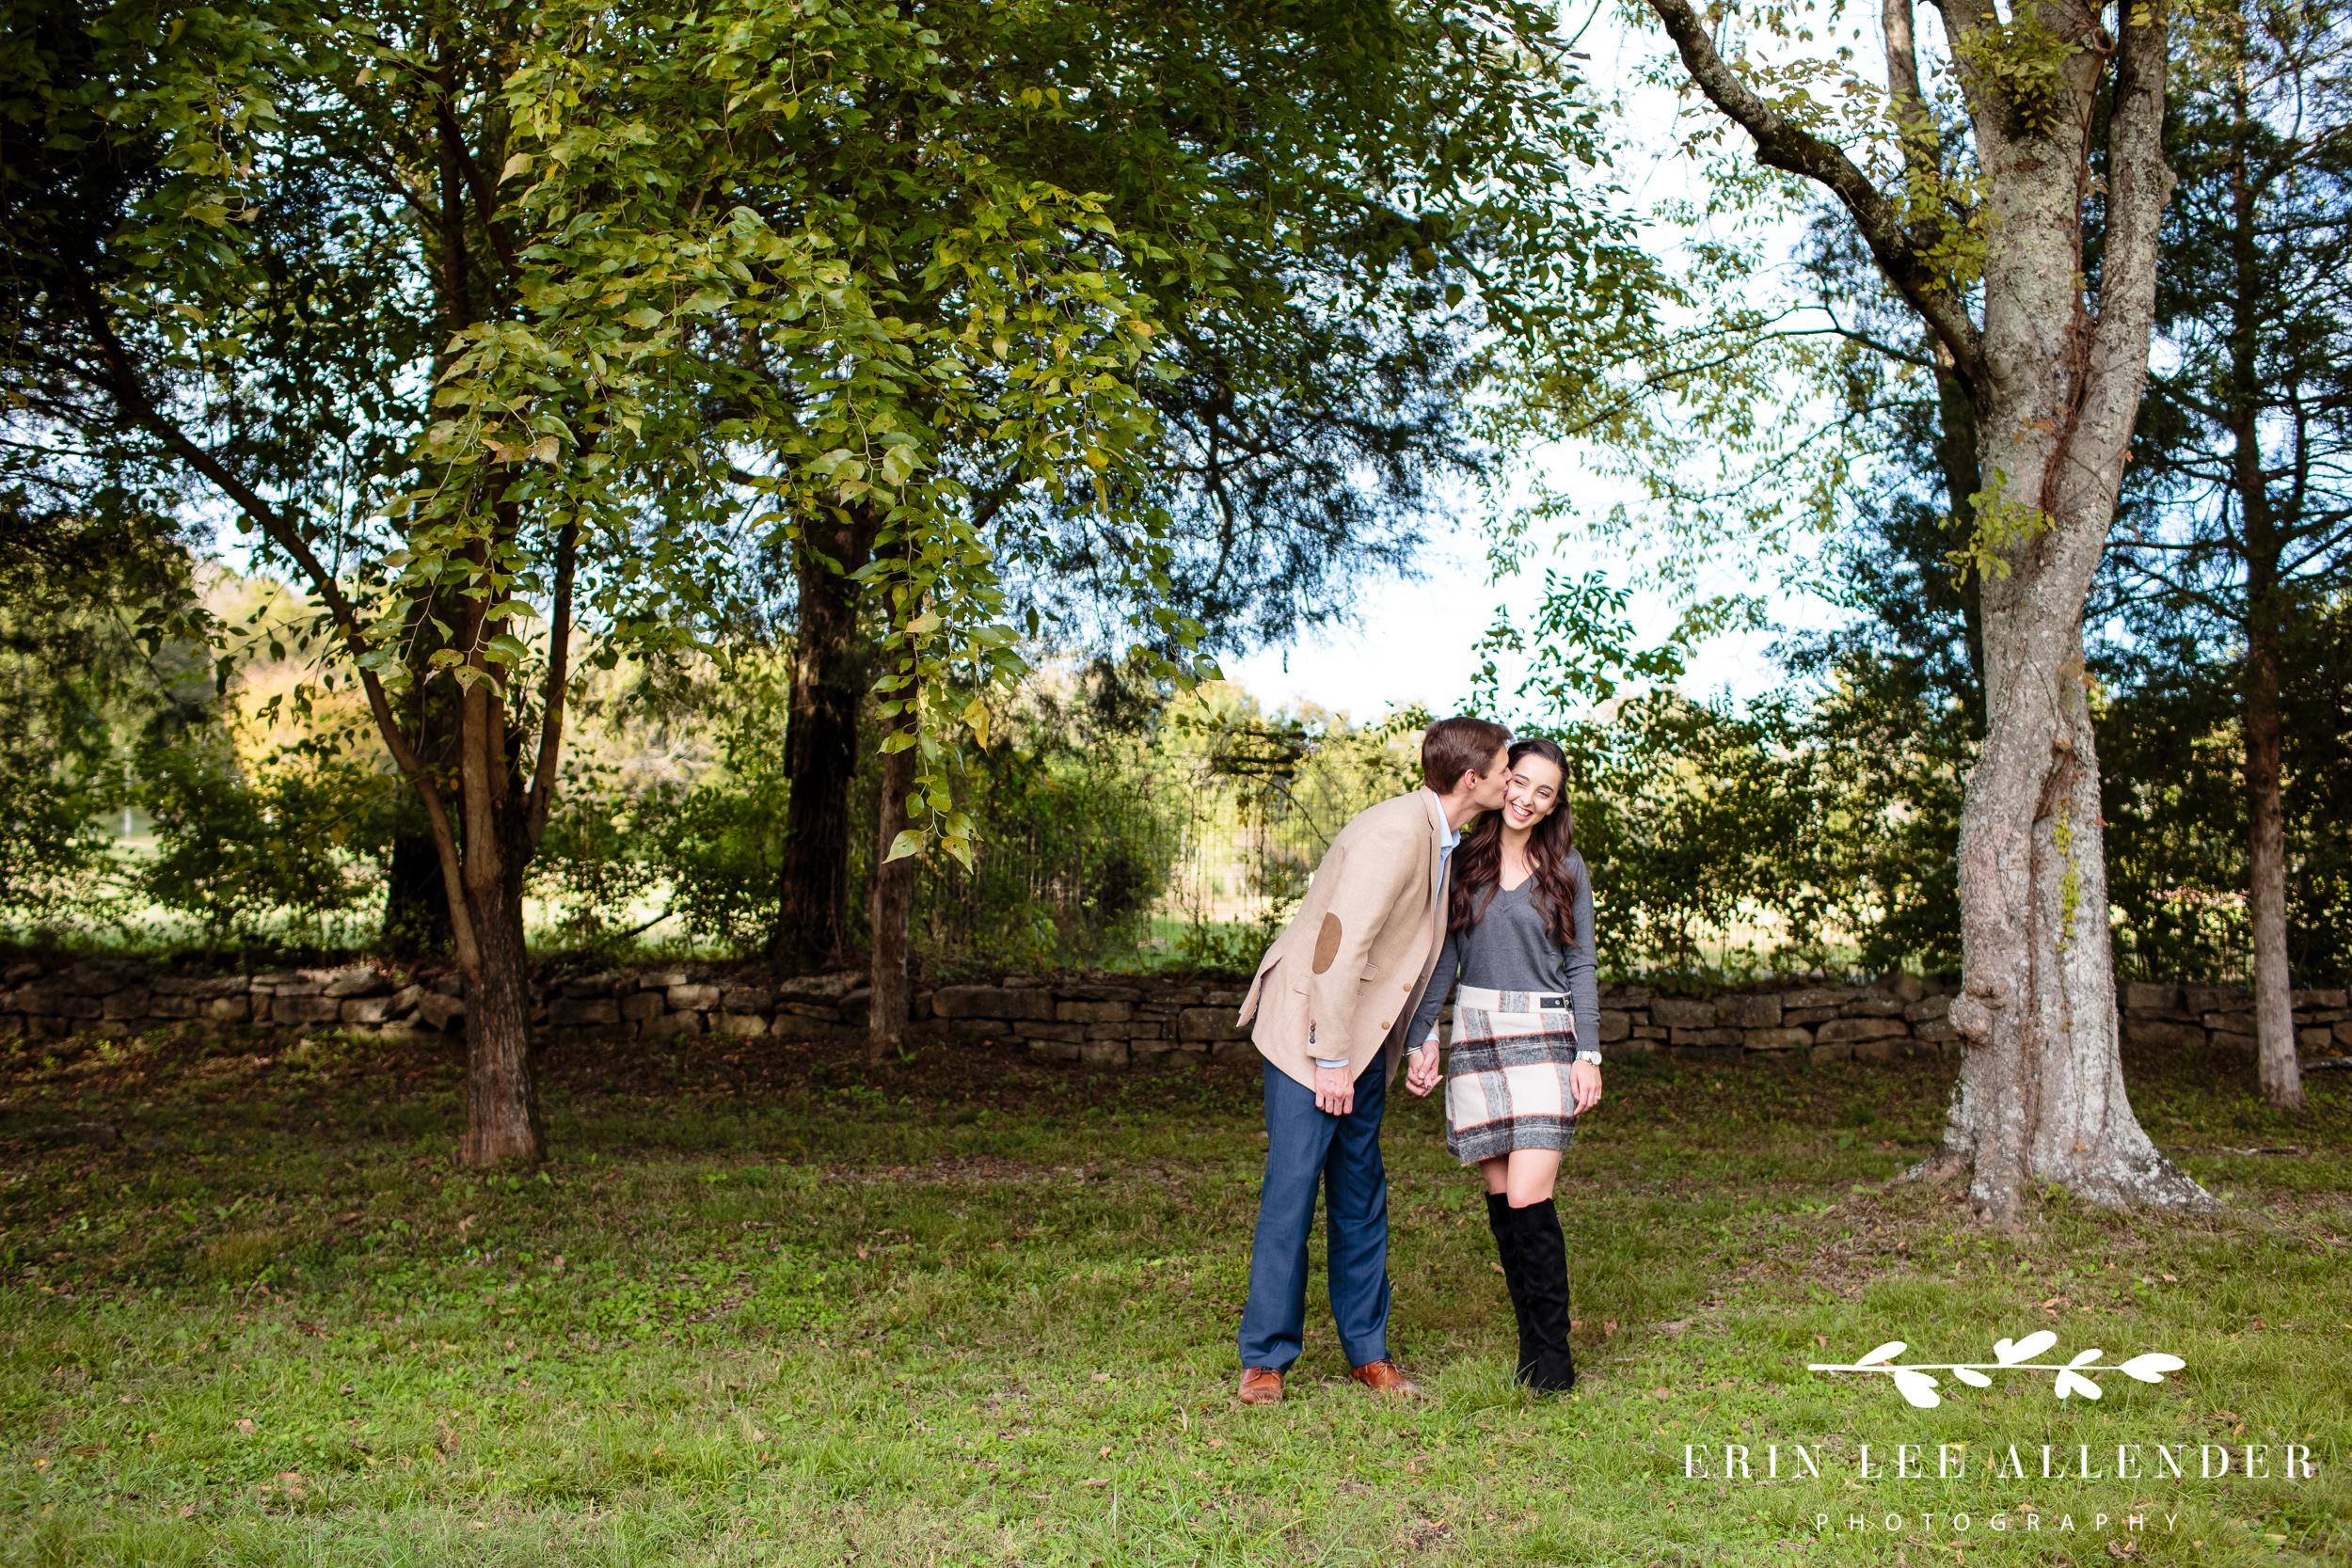 boyfriend-kisses-fiance-on-cheek